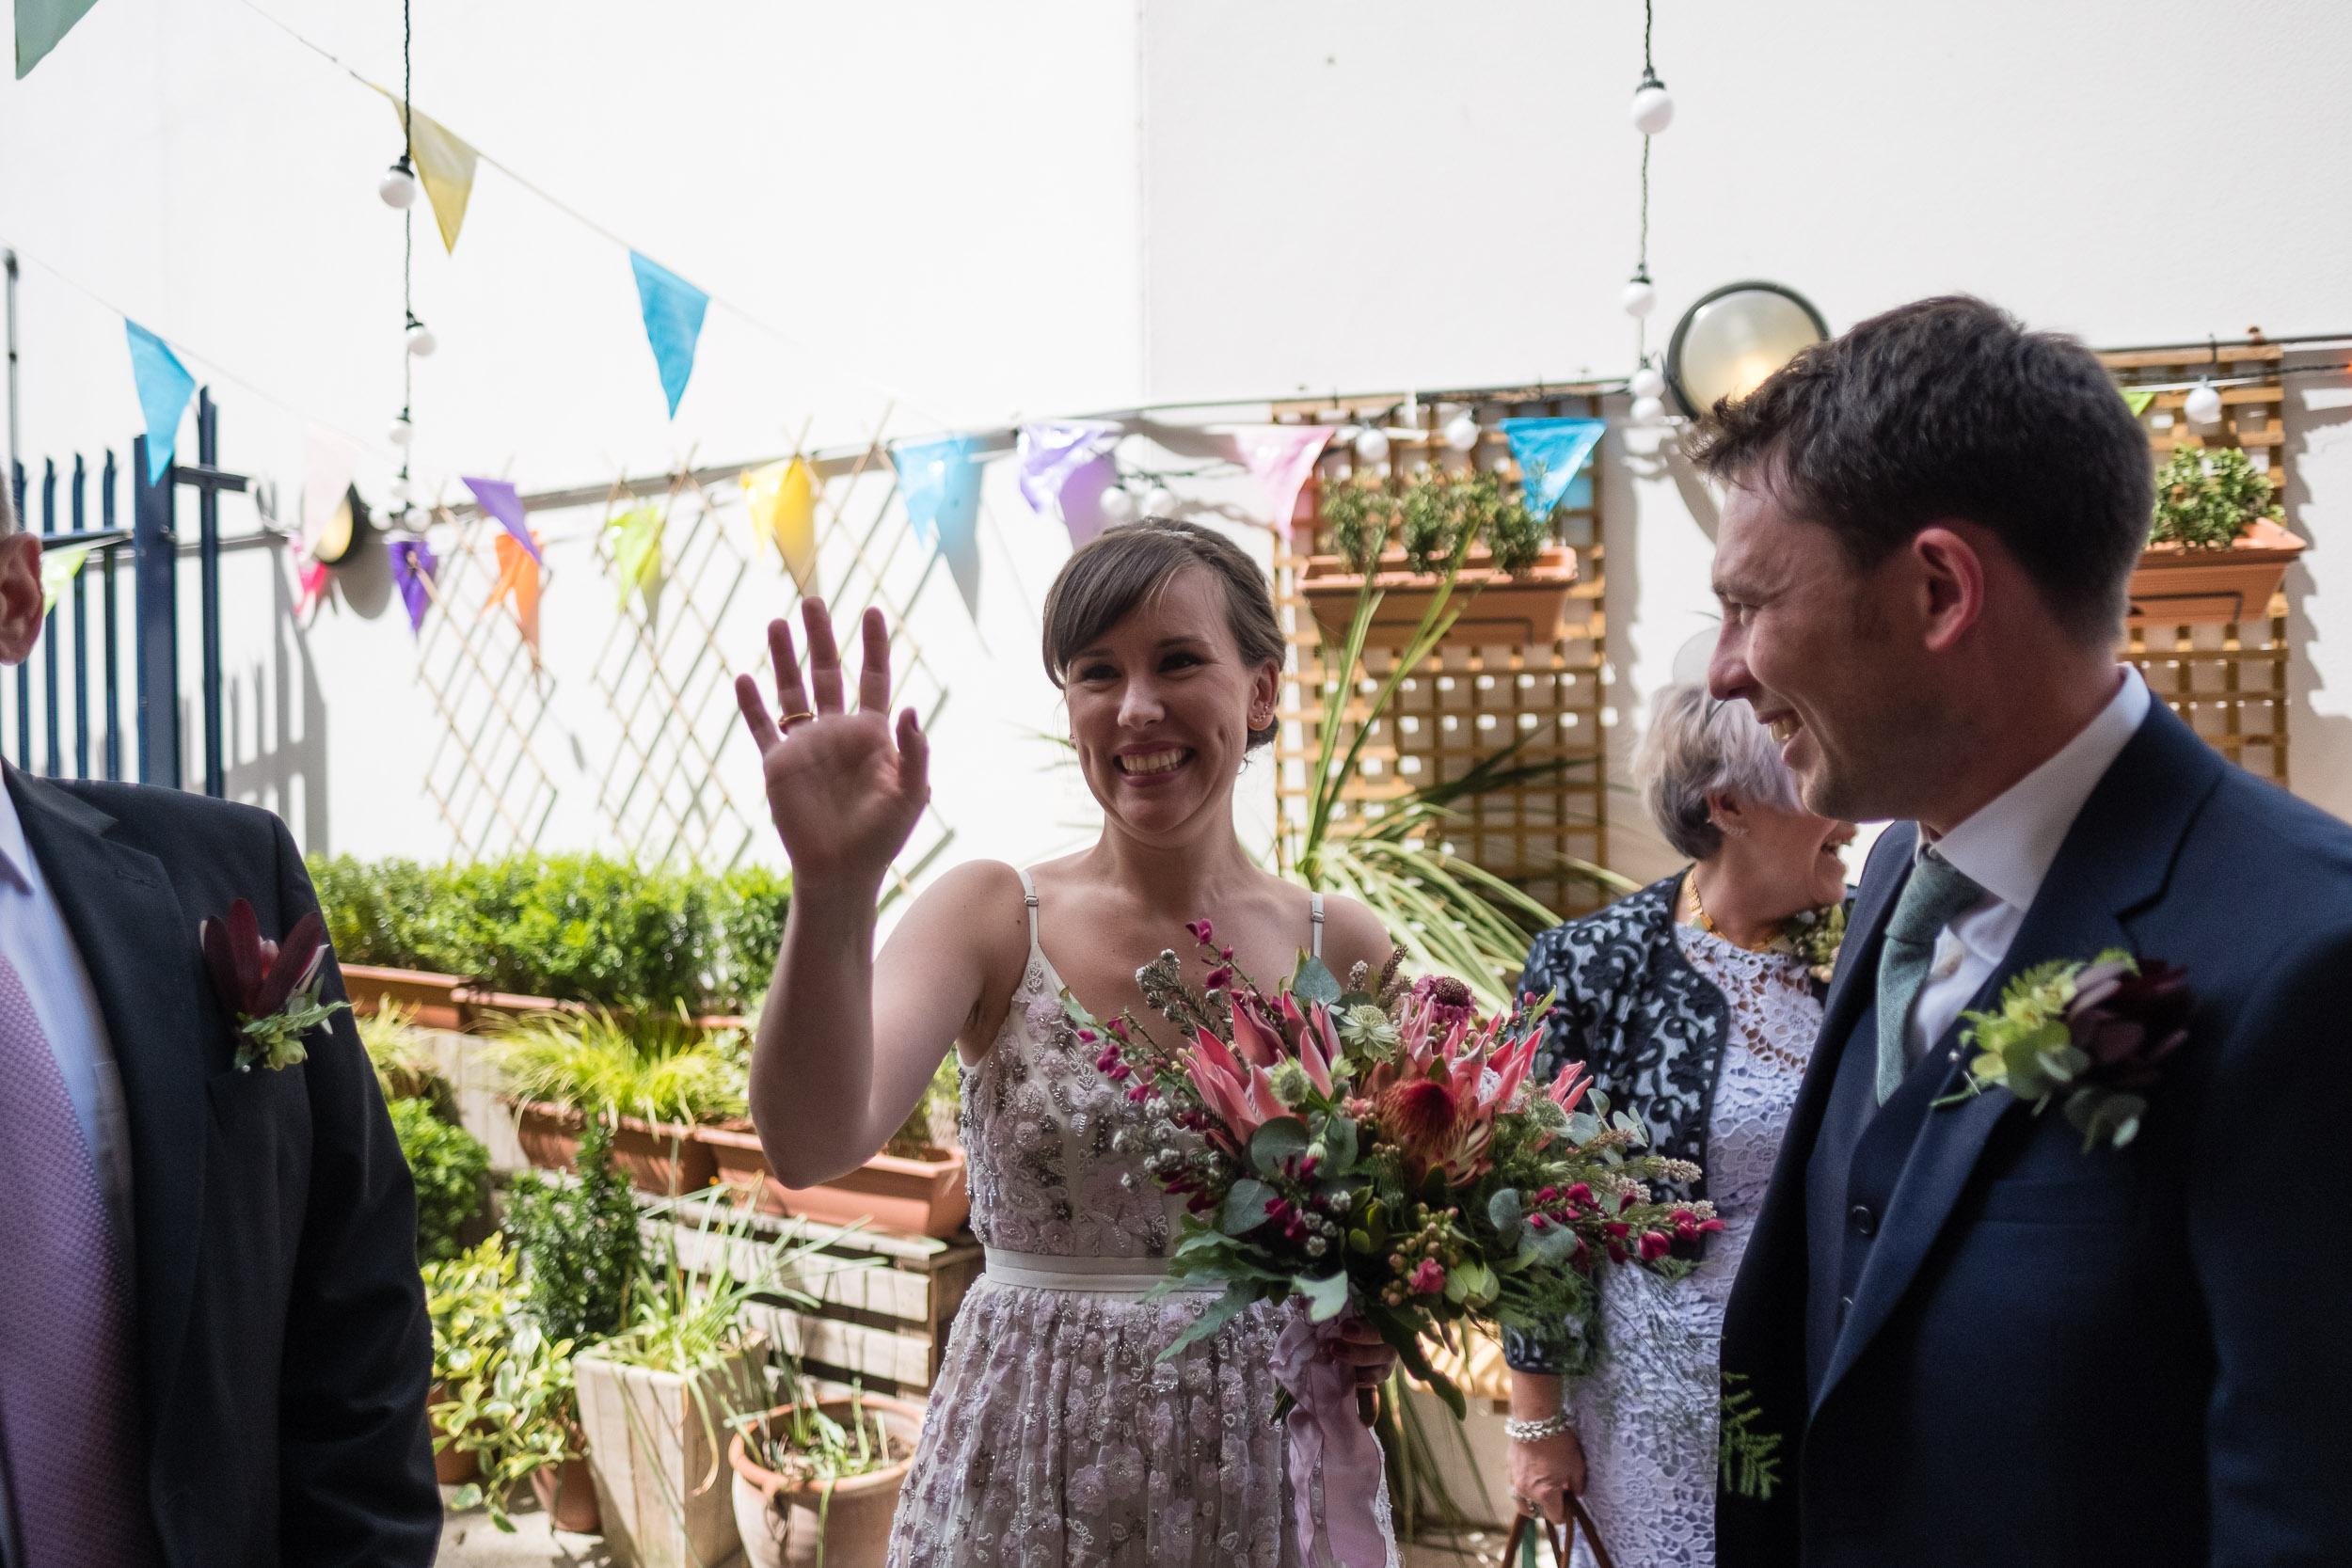 brockwell-lido-brixton-herne-hill-wedding-048.jpg